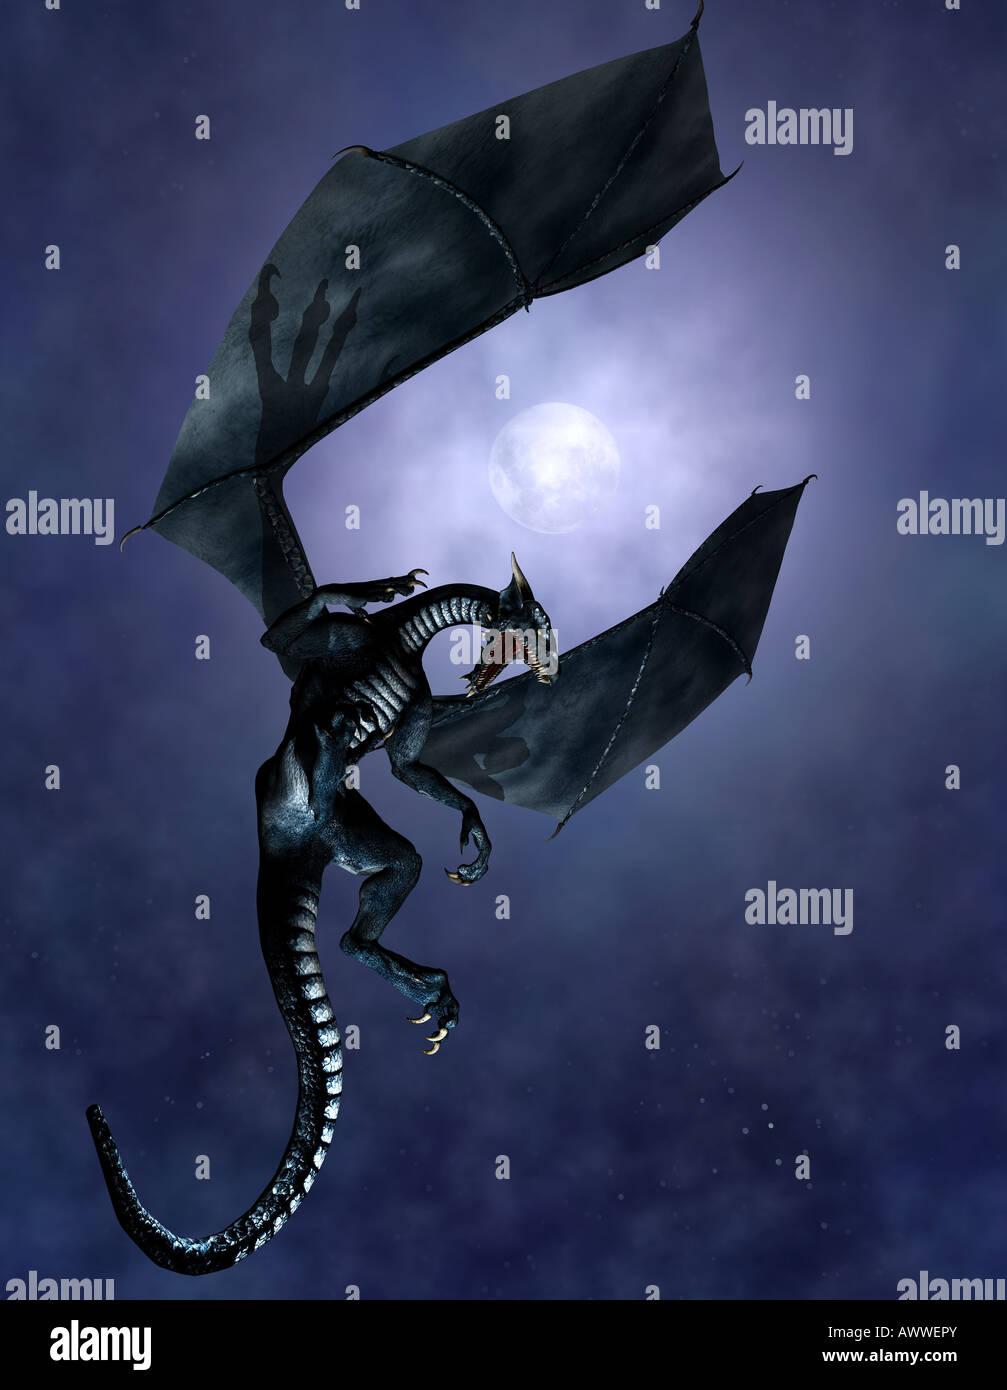 Dragon against sky - Stock Image